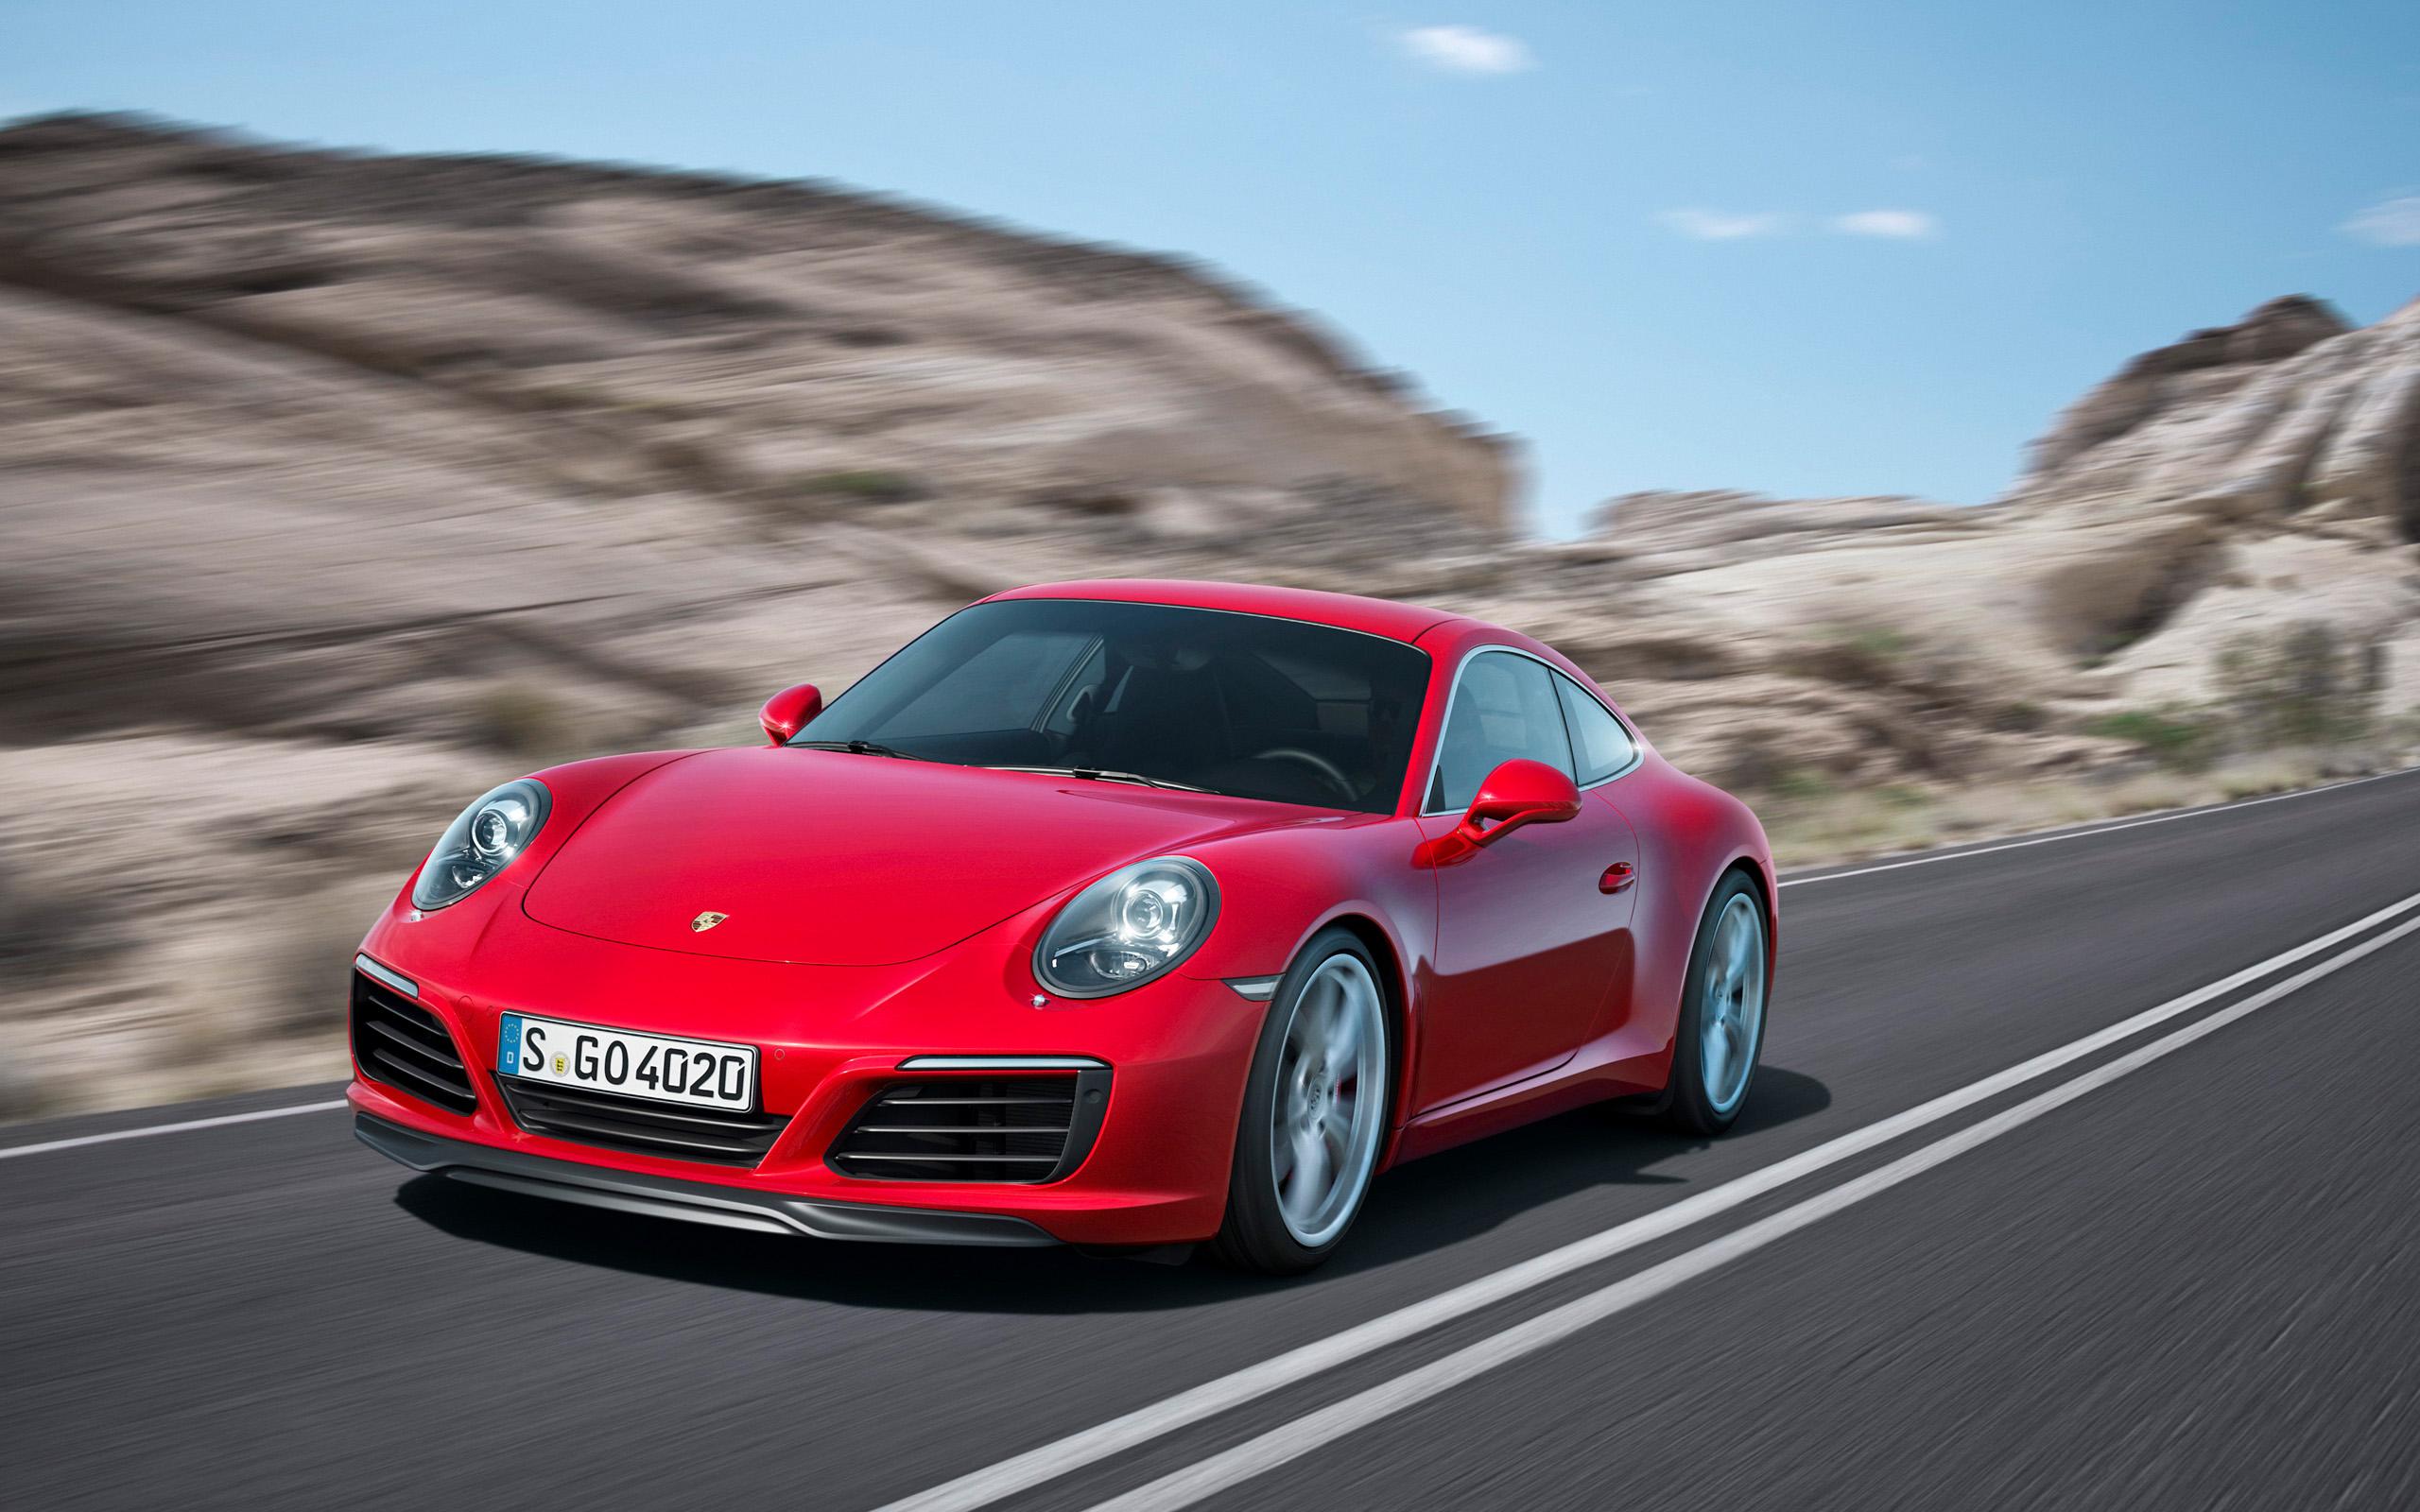 Porsche 911 Wallpapers Pictures Images 2560x1600